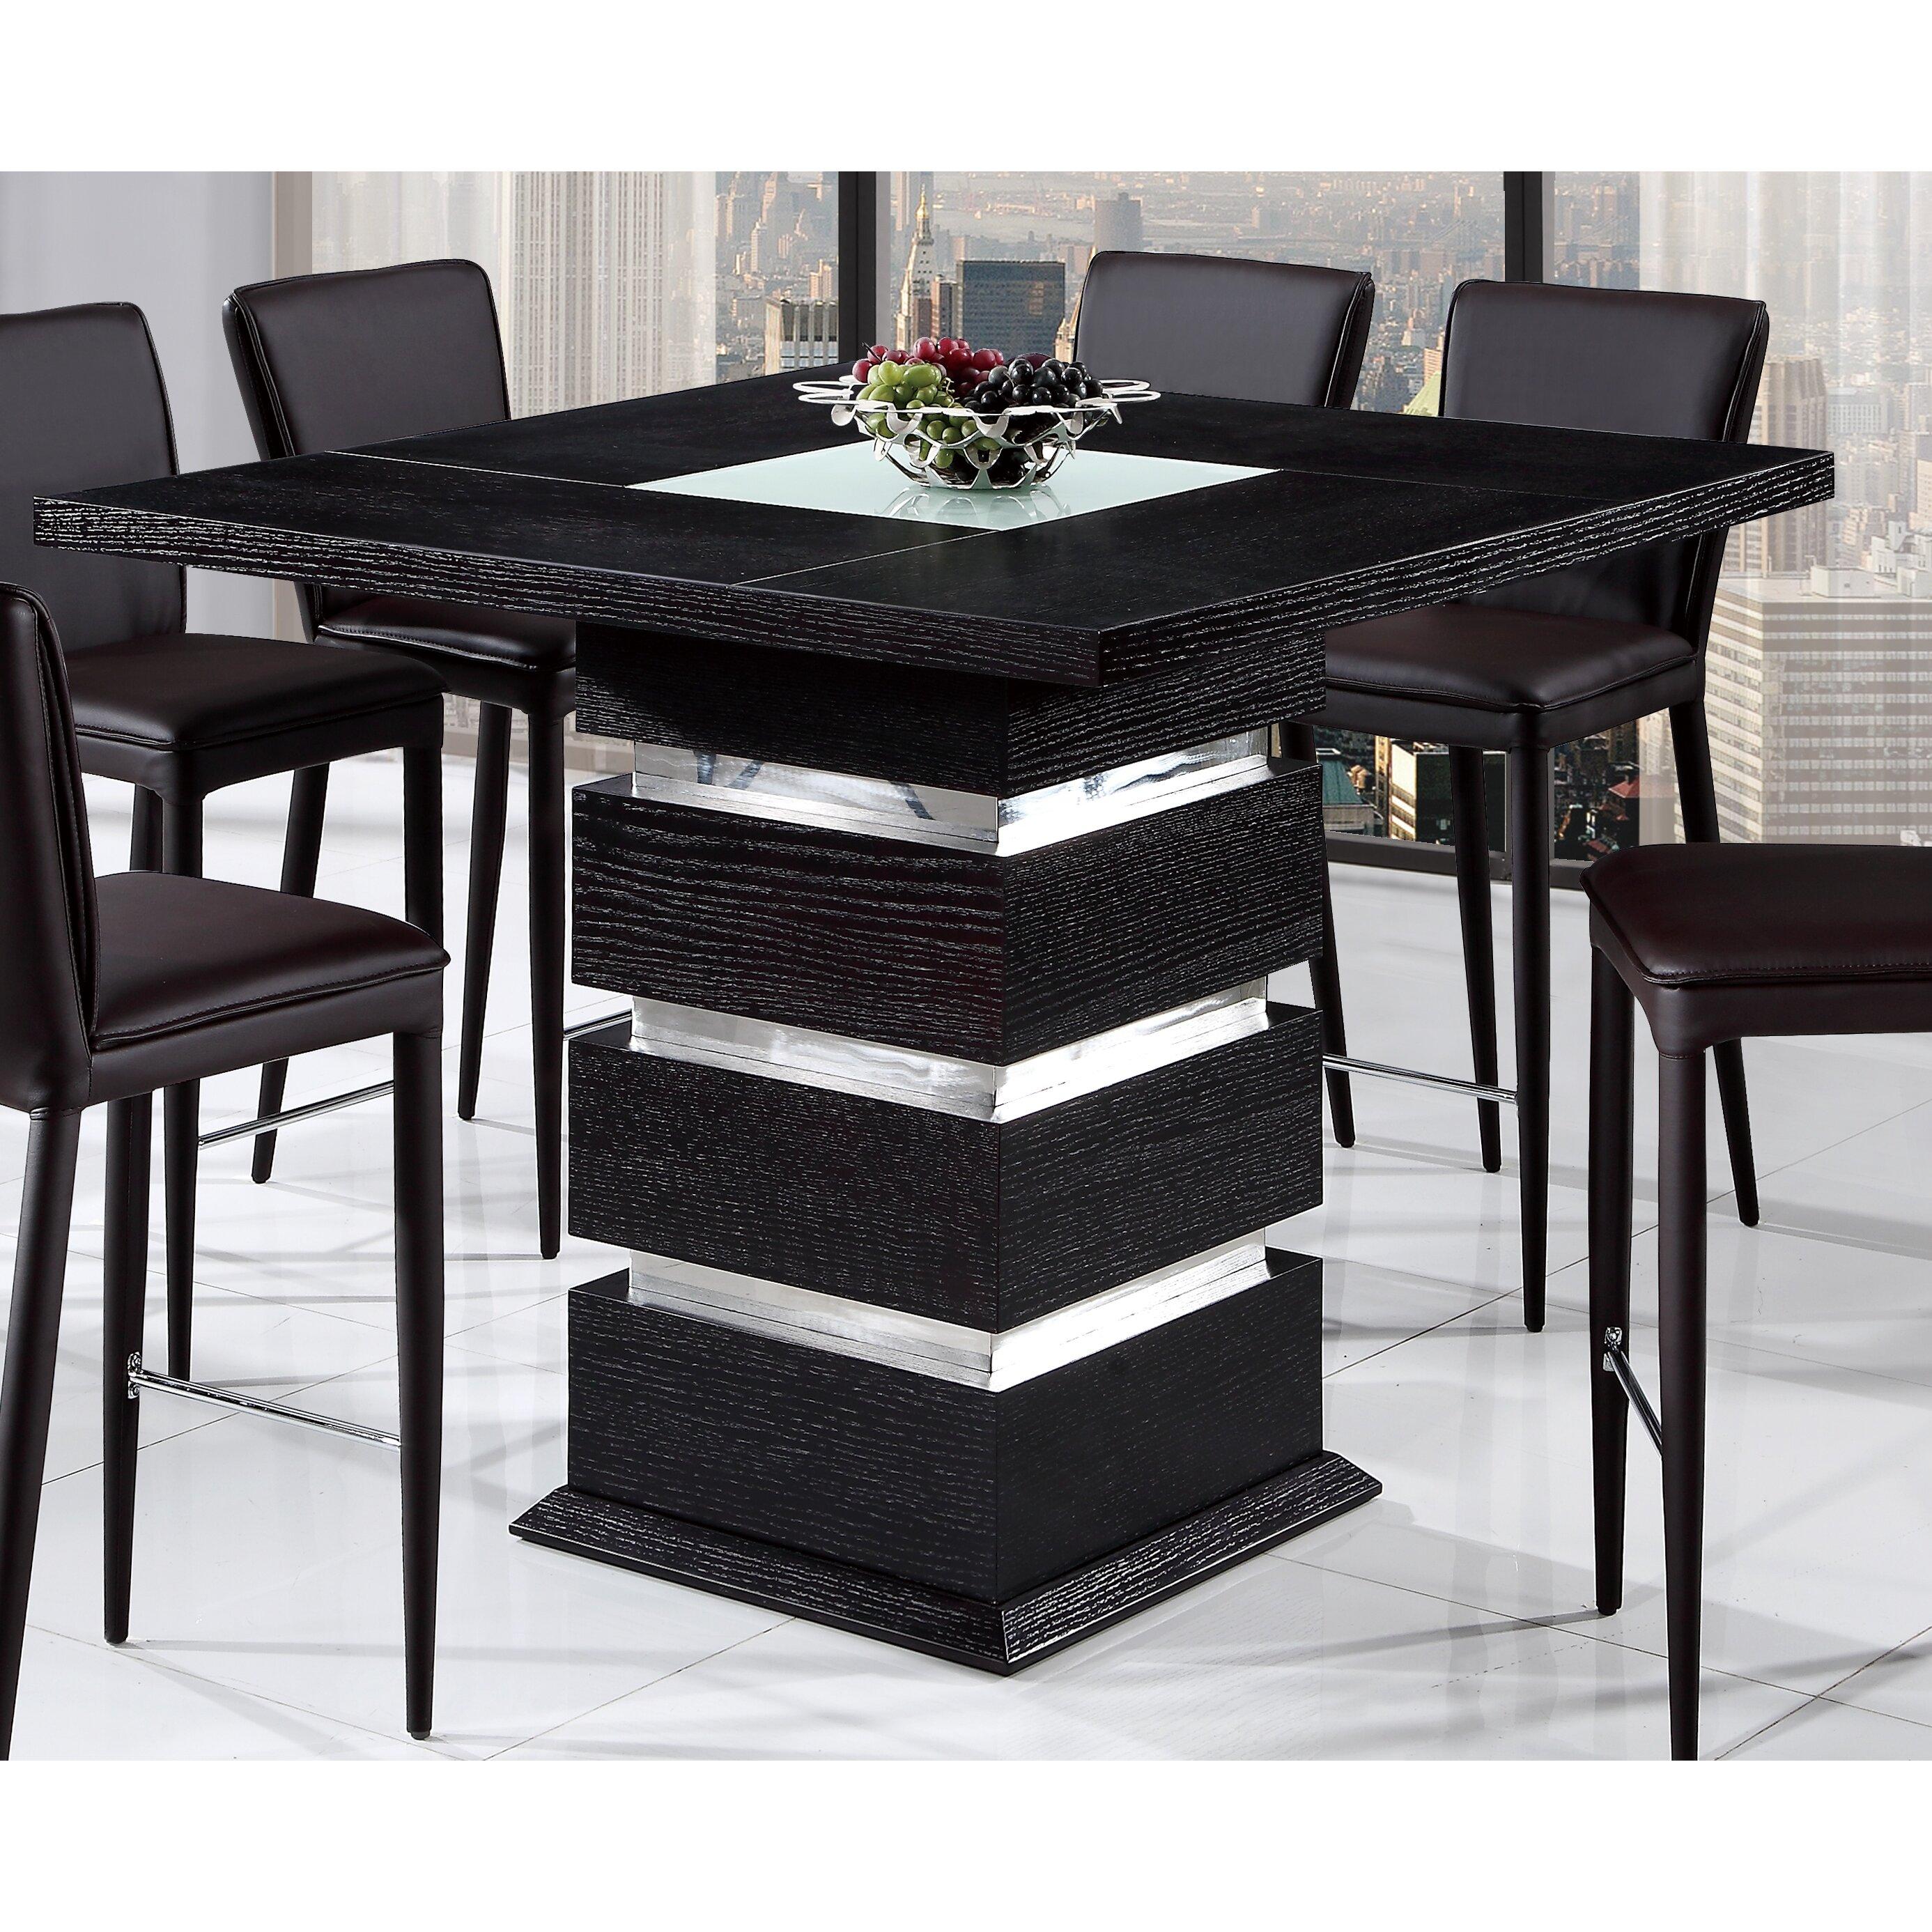 Global Furniture USA Pub Table Wayfair - Dining room furniture usa